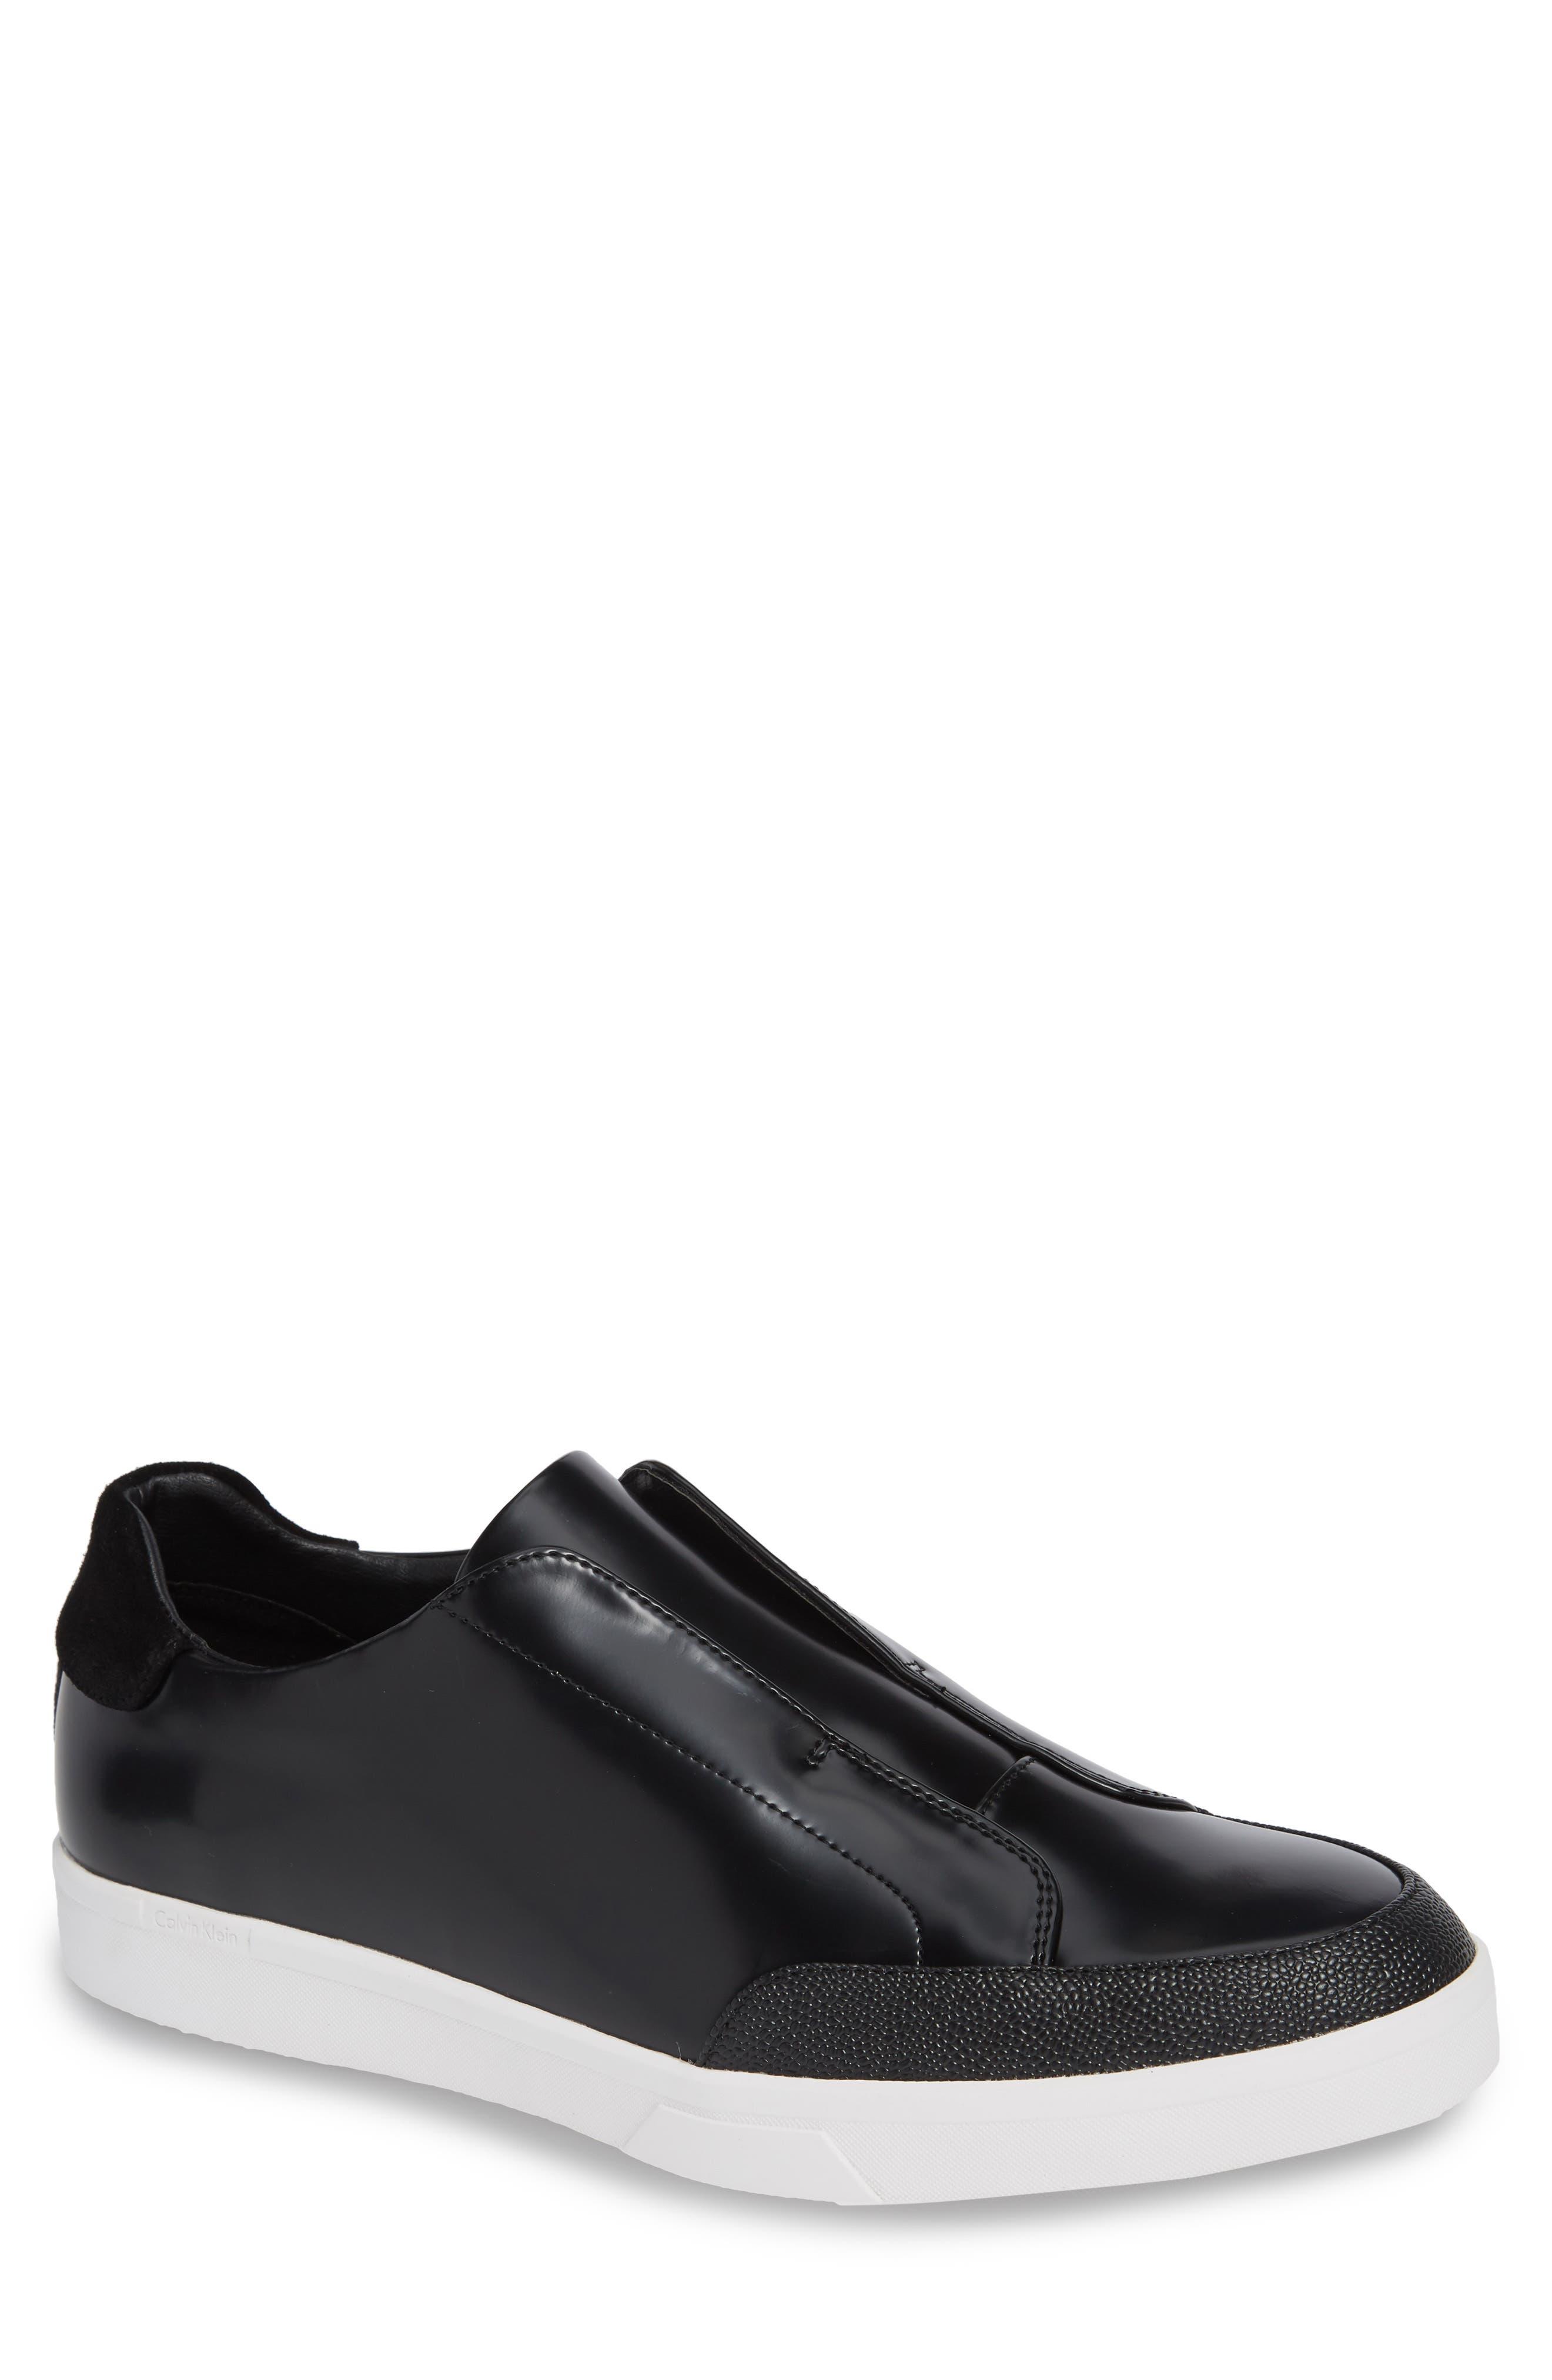 CALVIN KLEIN Immanuel Slip-On Sneaker, Main, color, BLACK LEATHER